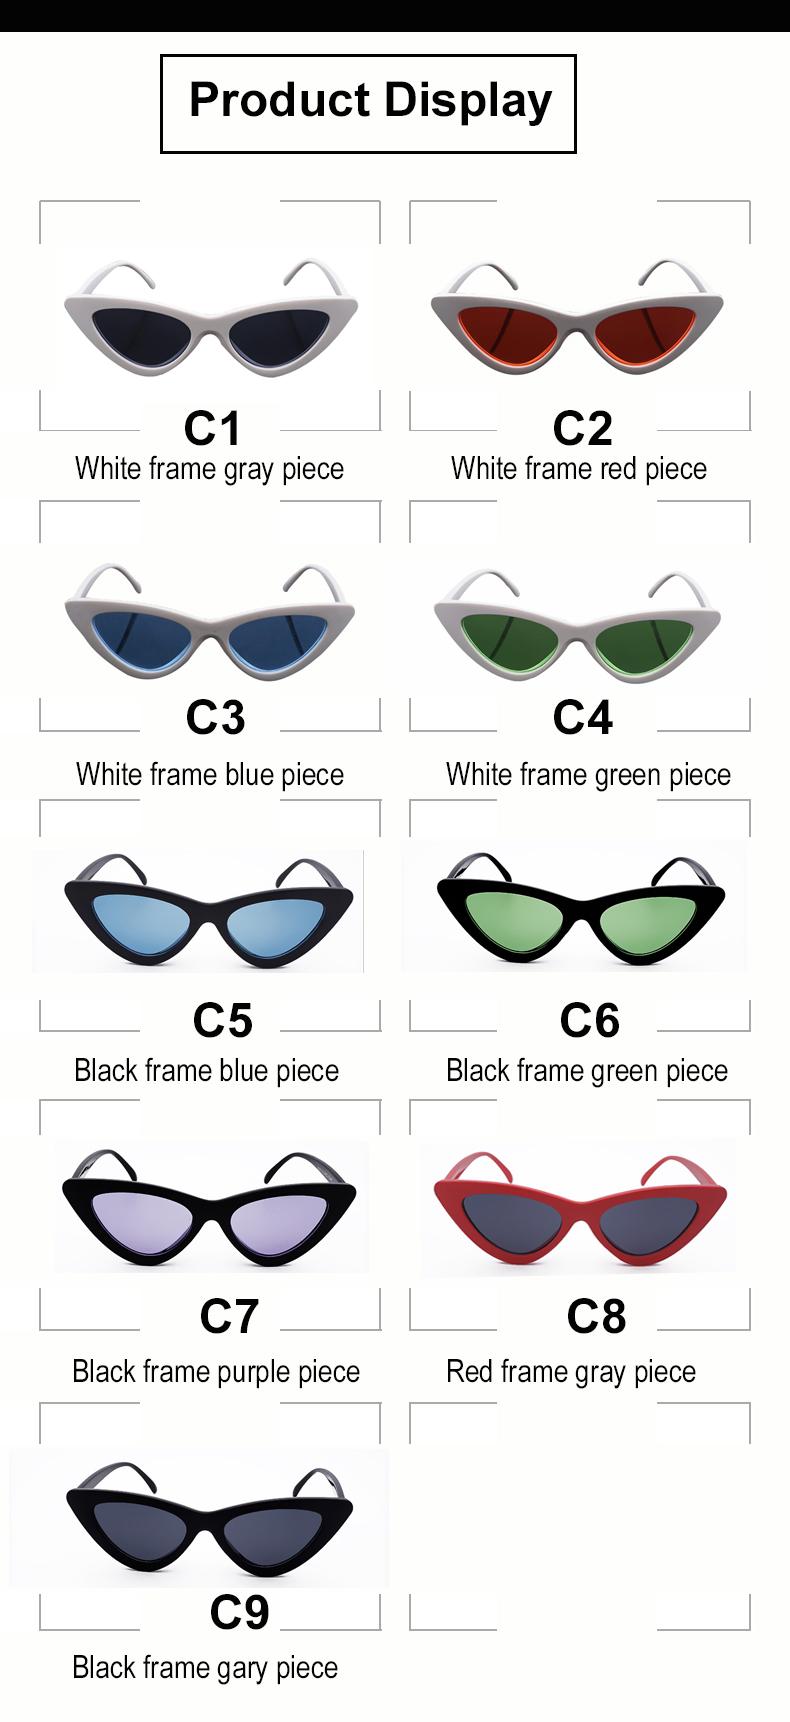 HTB1rv7enBUSMeJjy1zjq6A0dXXaM - WHO CUTIE 2018 Brand Designer Black Cat Eye Sunglasses Women Cool Small Cateye Frame Sun Glasses Fashion UV400 Shades WG-008